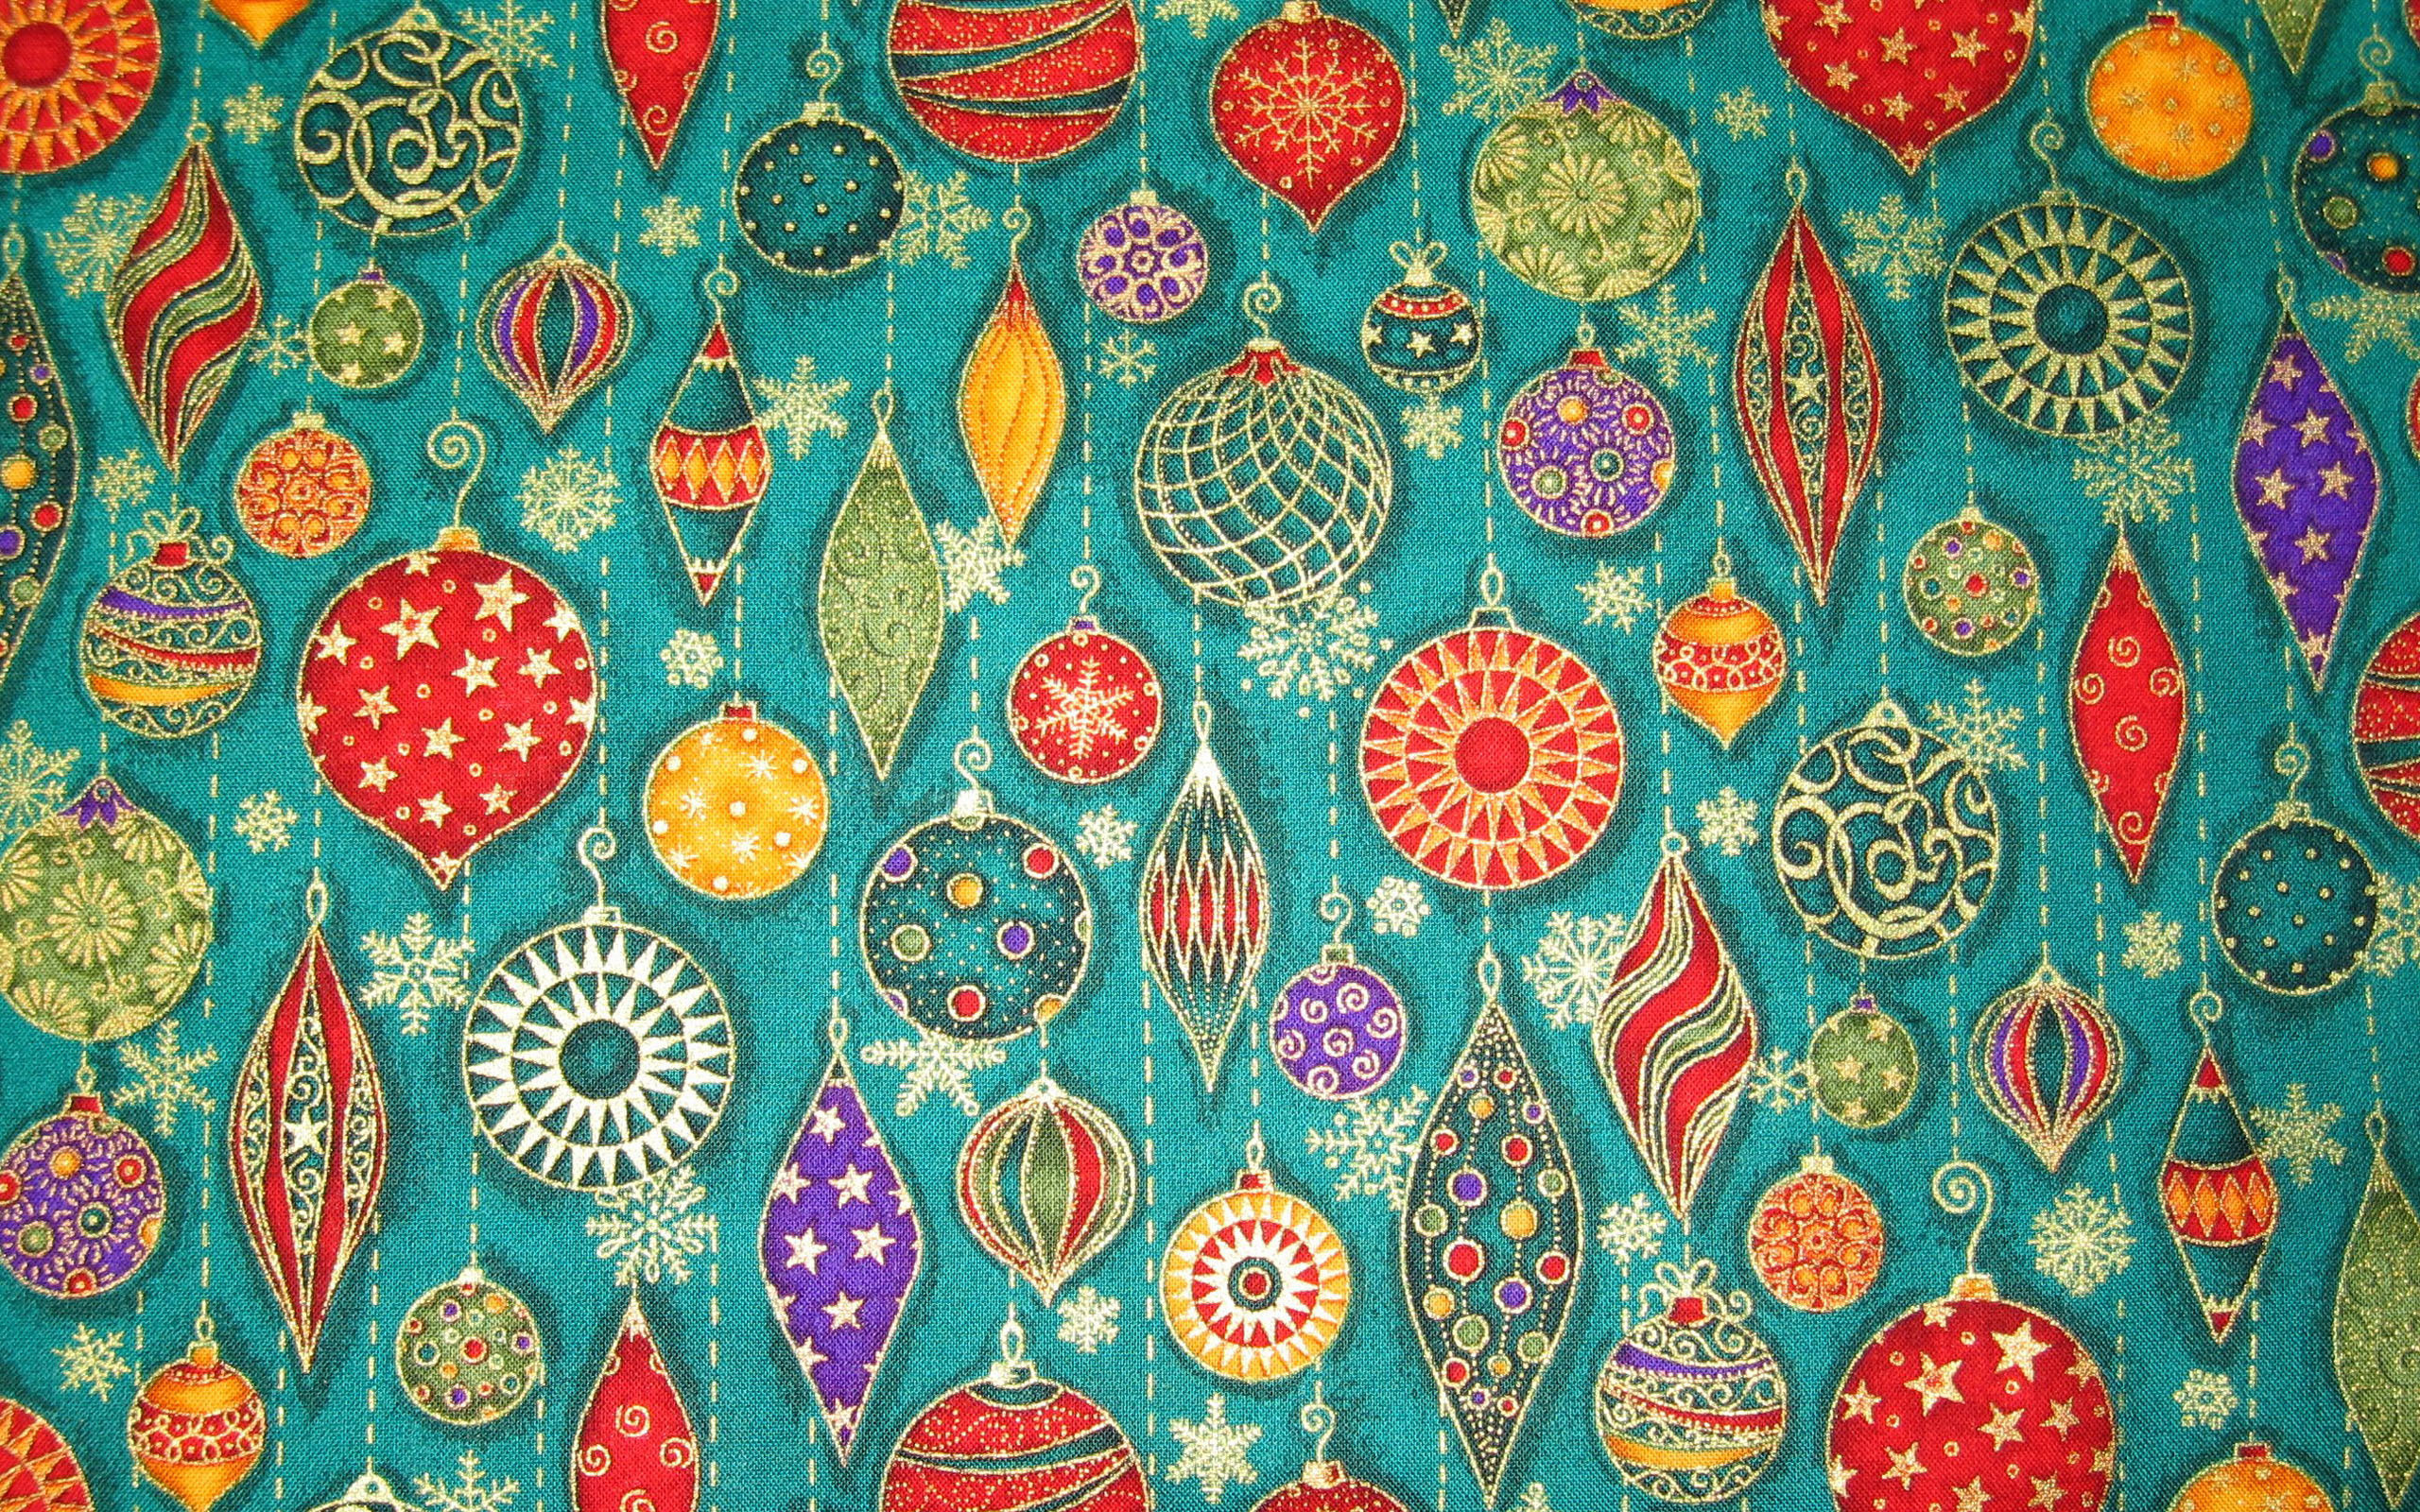 Tapestry Wallpaper Desktop ①